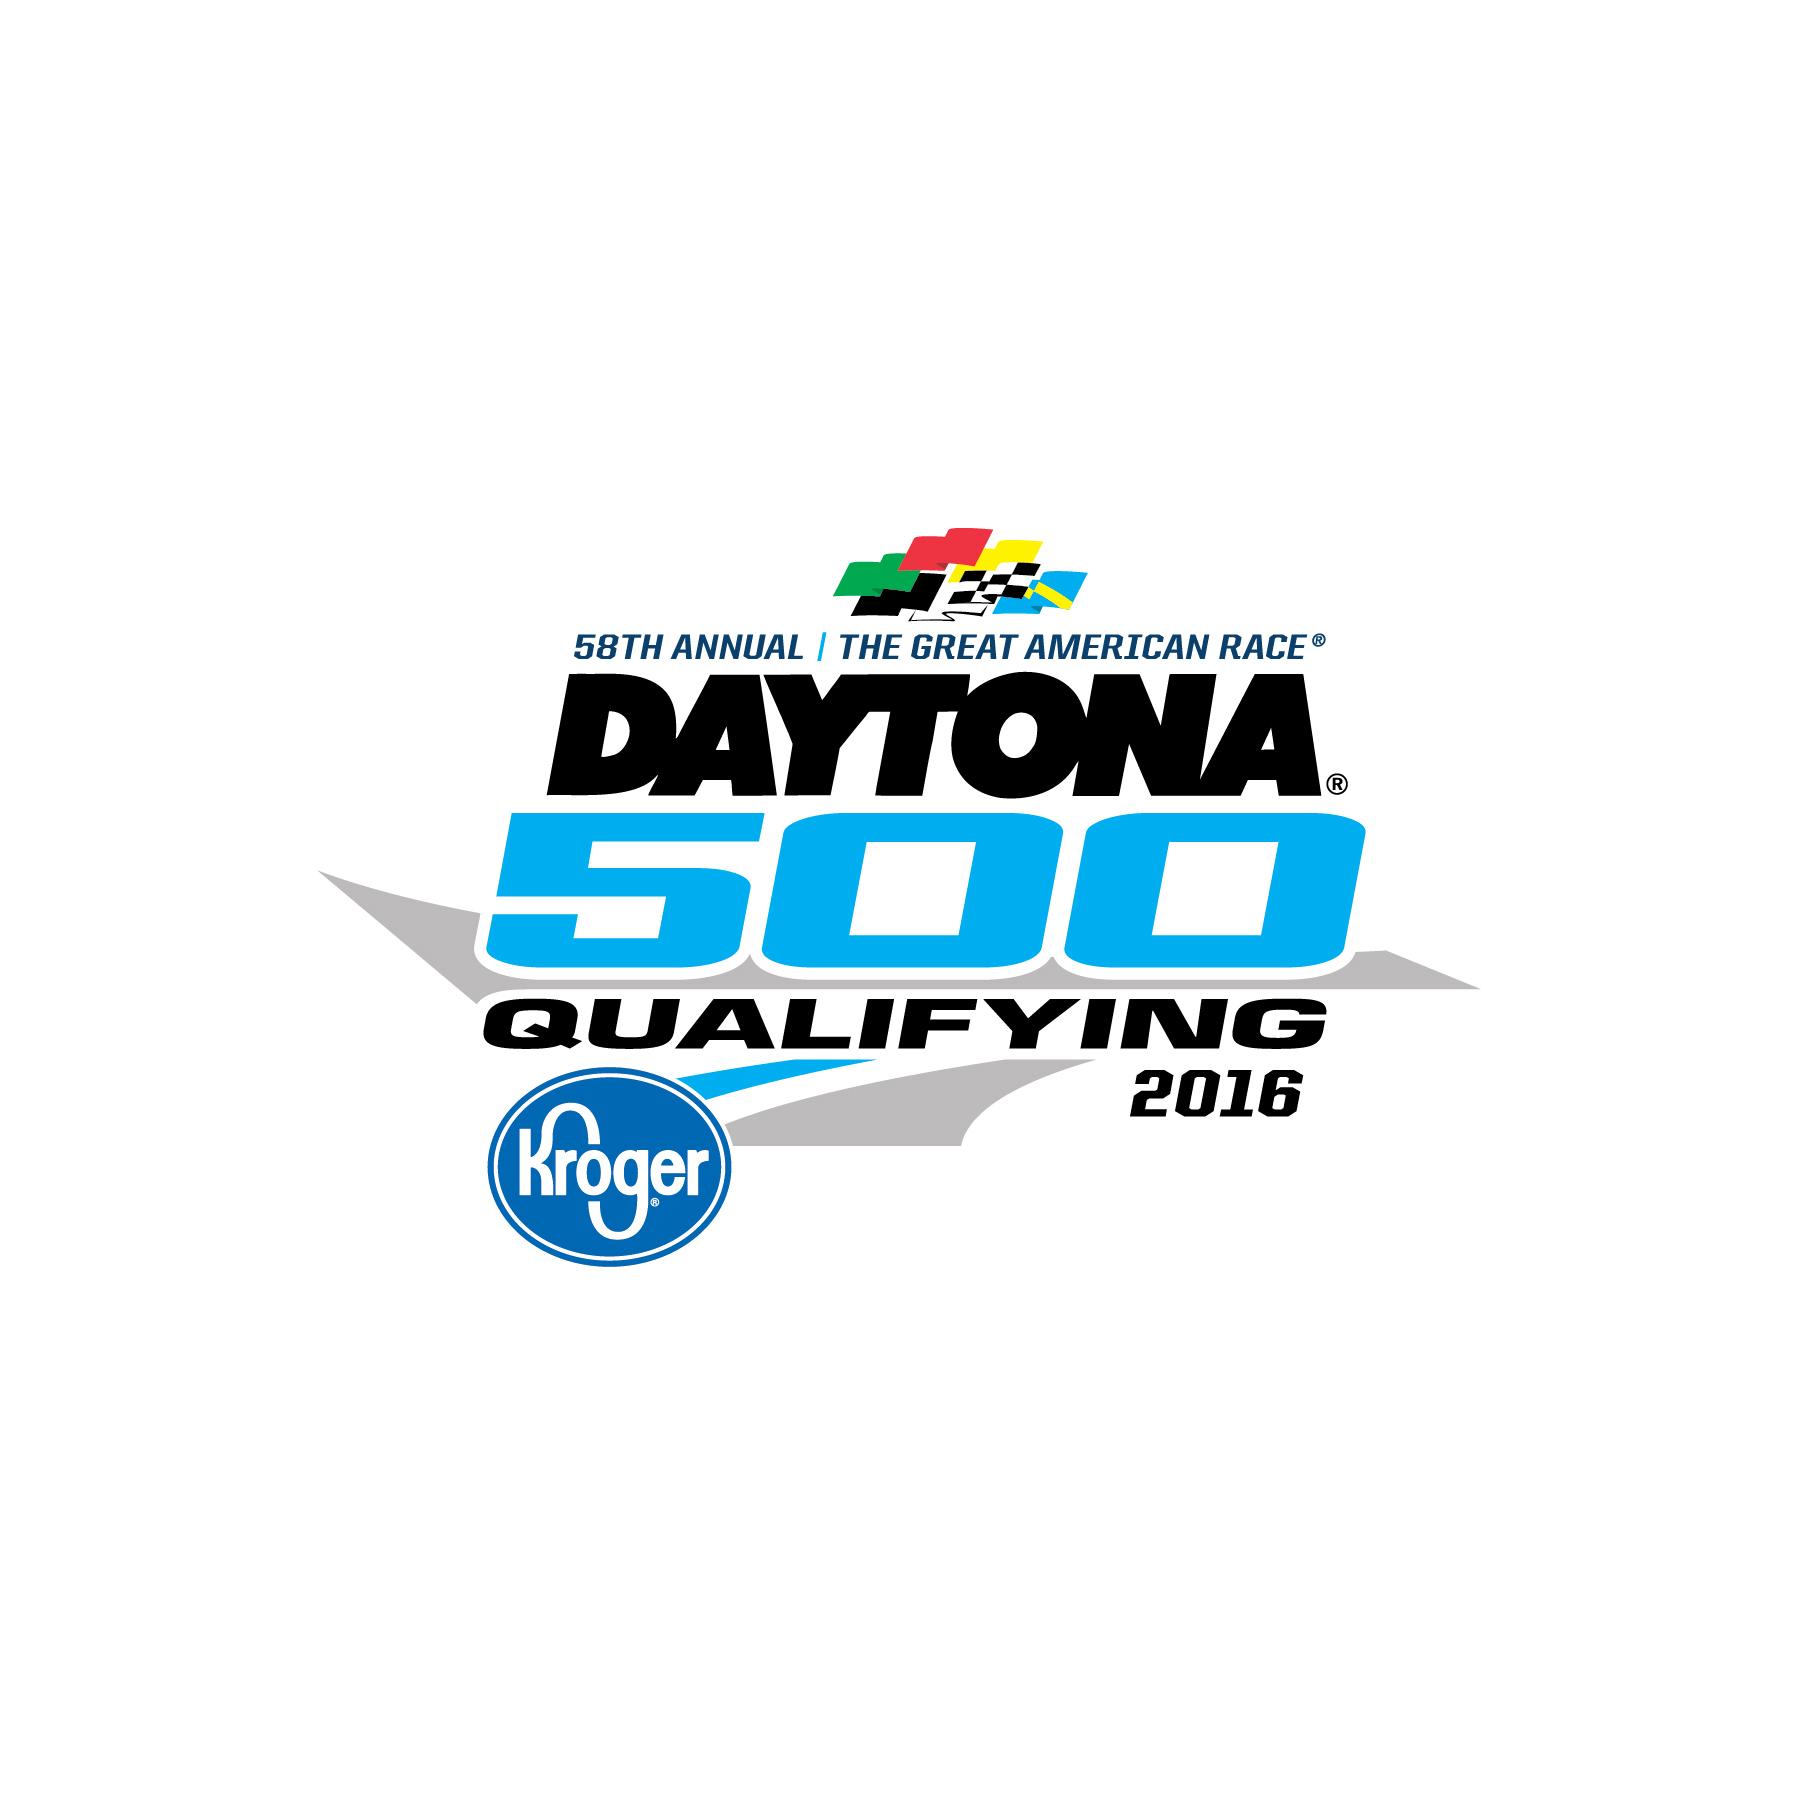 Free Daytona 500 Cliparts, Download Free Clip Art, Free Clip Art on.